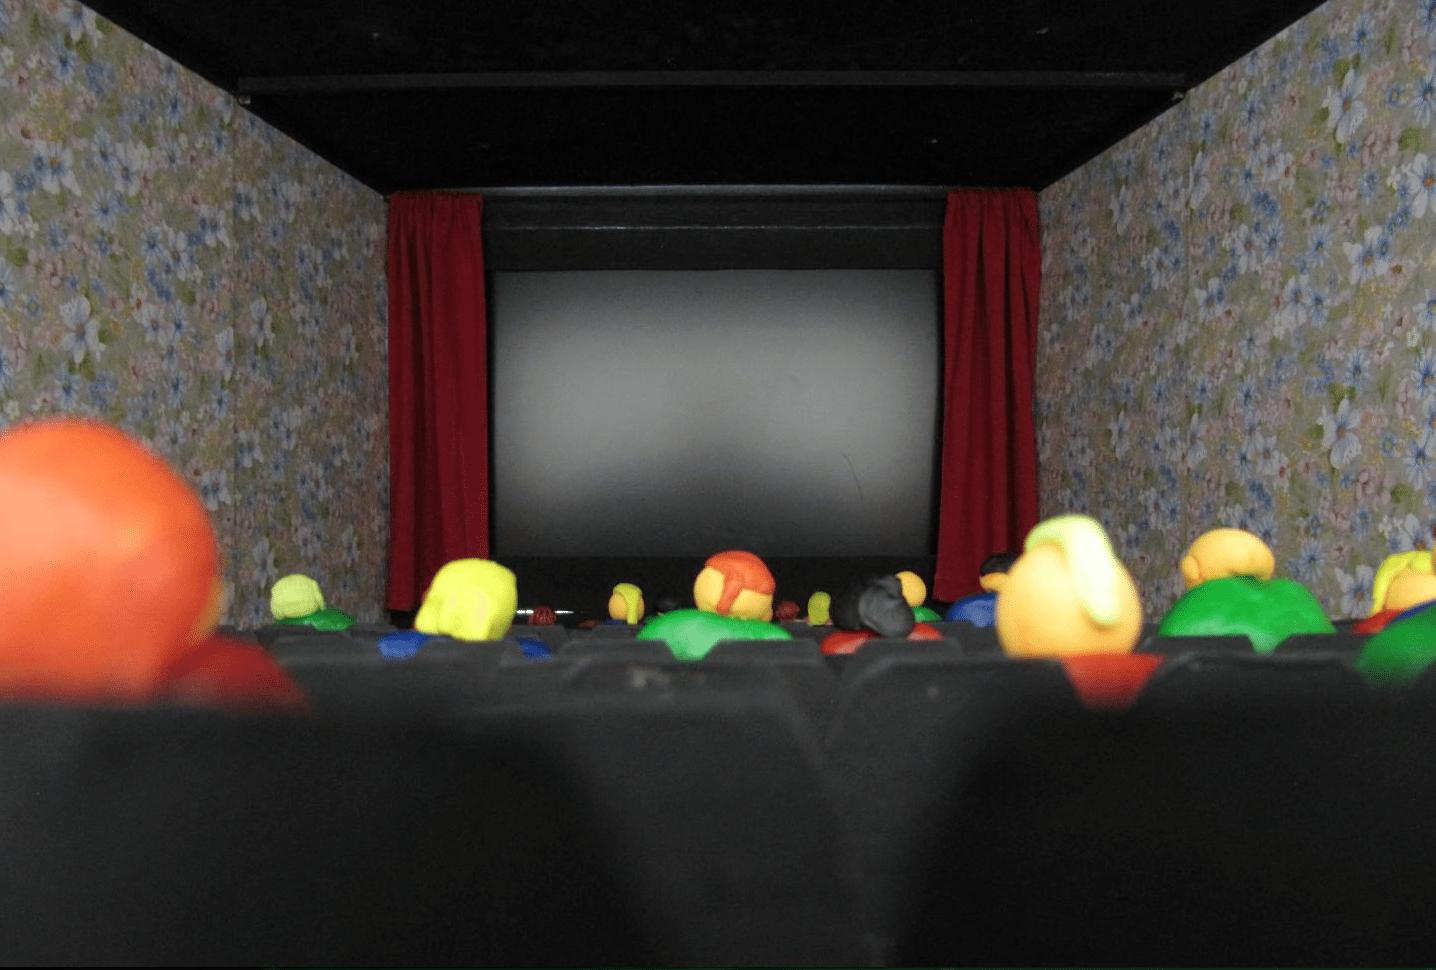 Simulated cinema